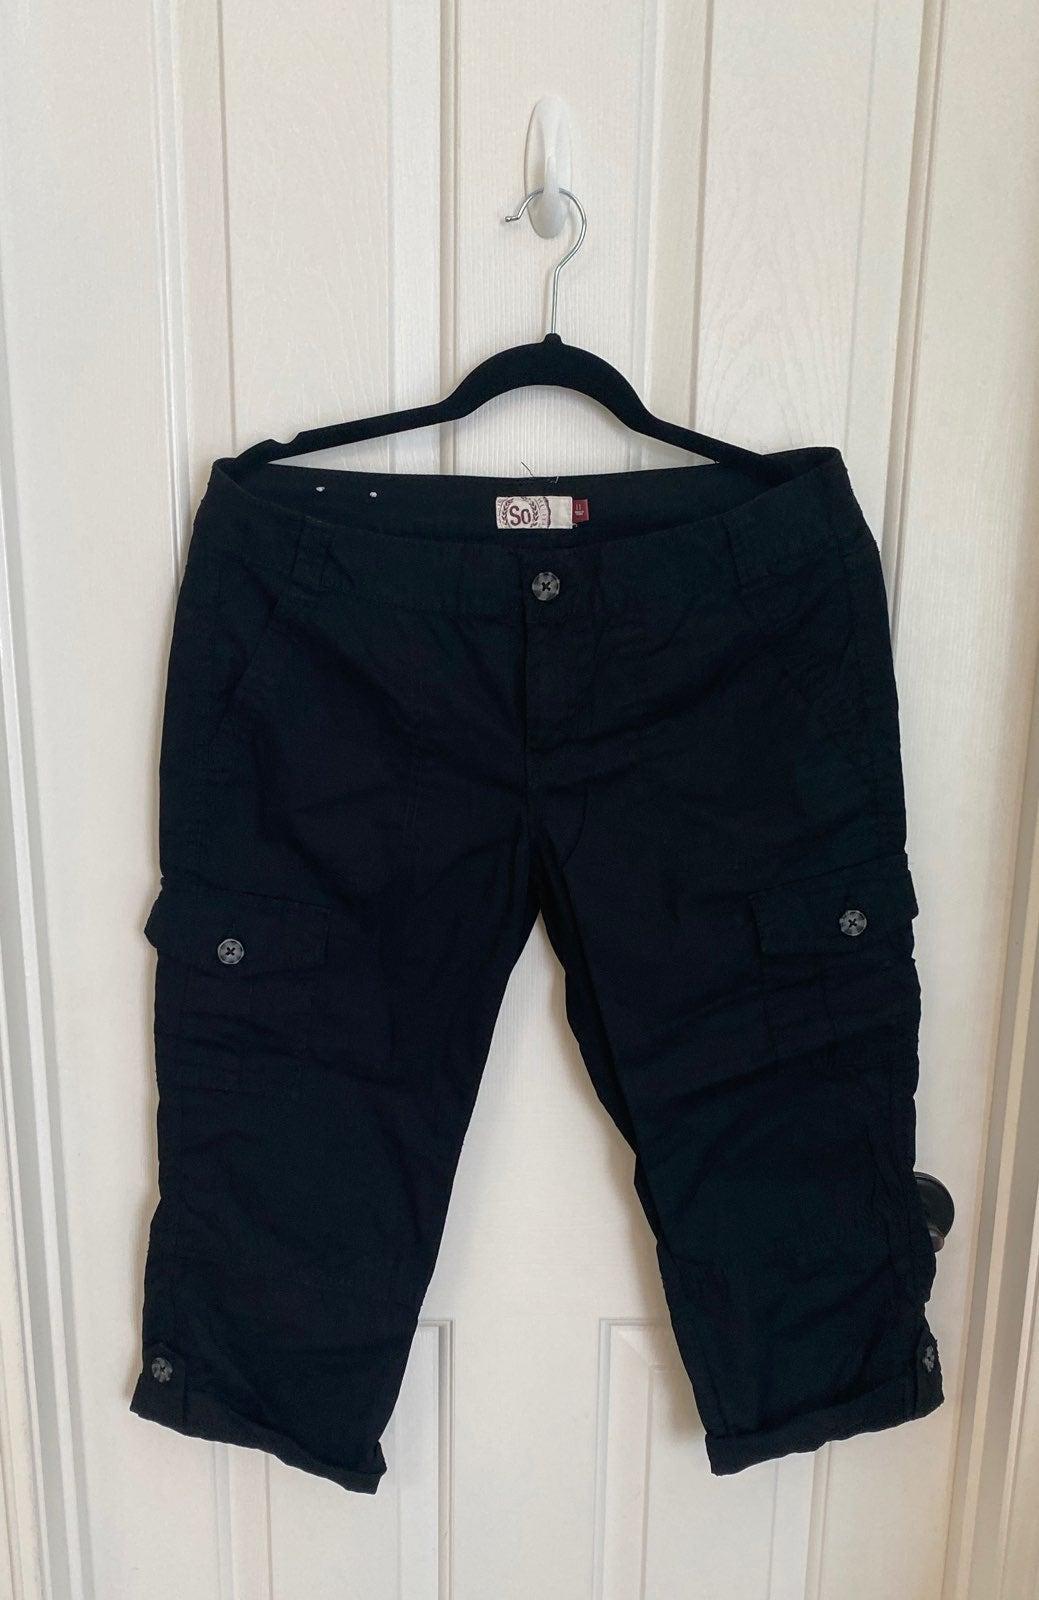 Womens black capri pants